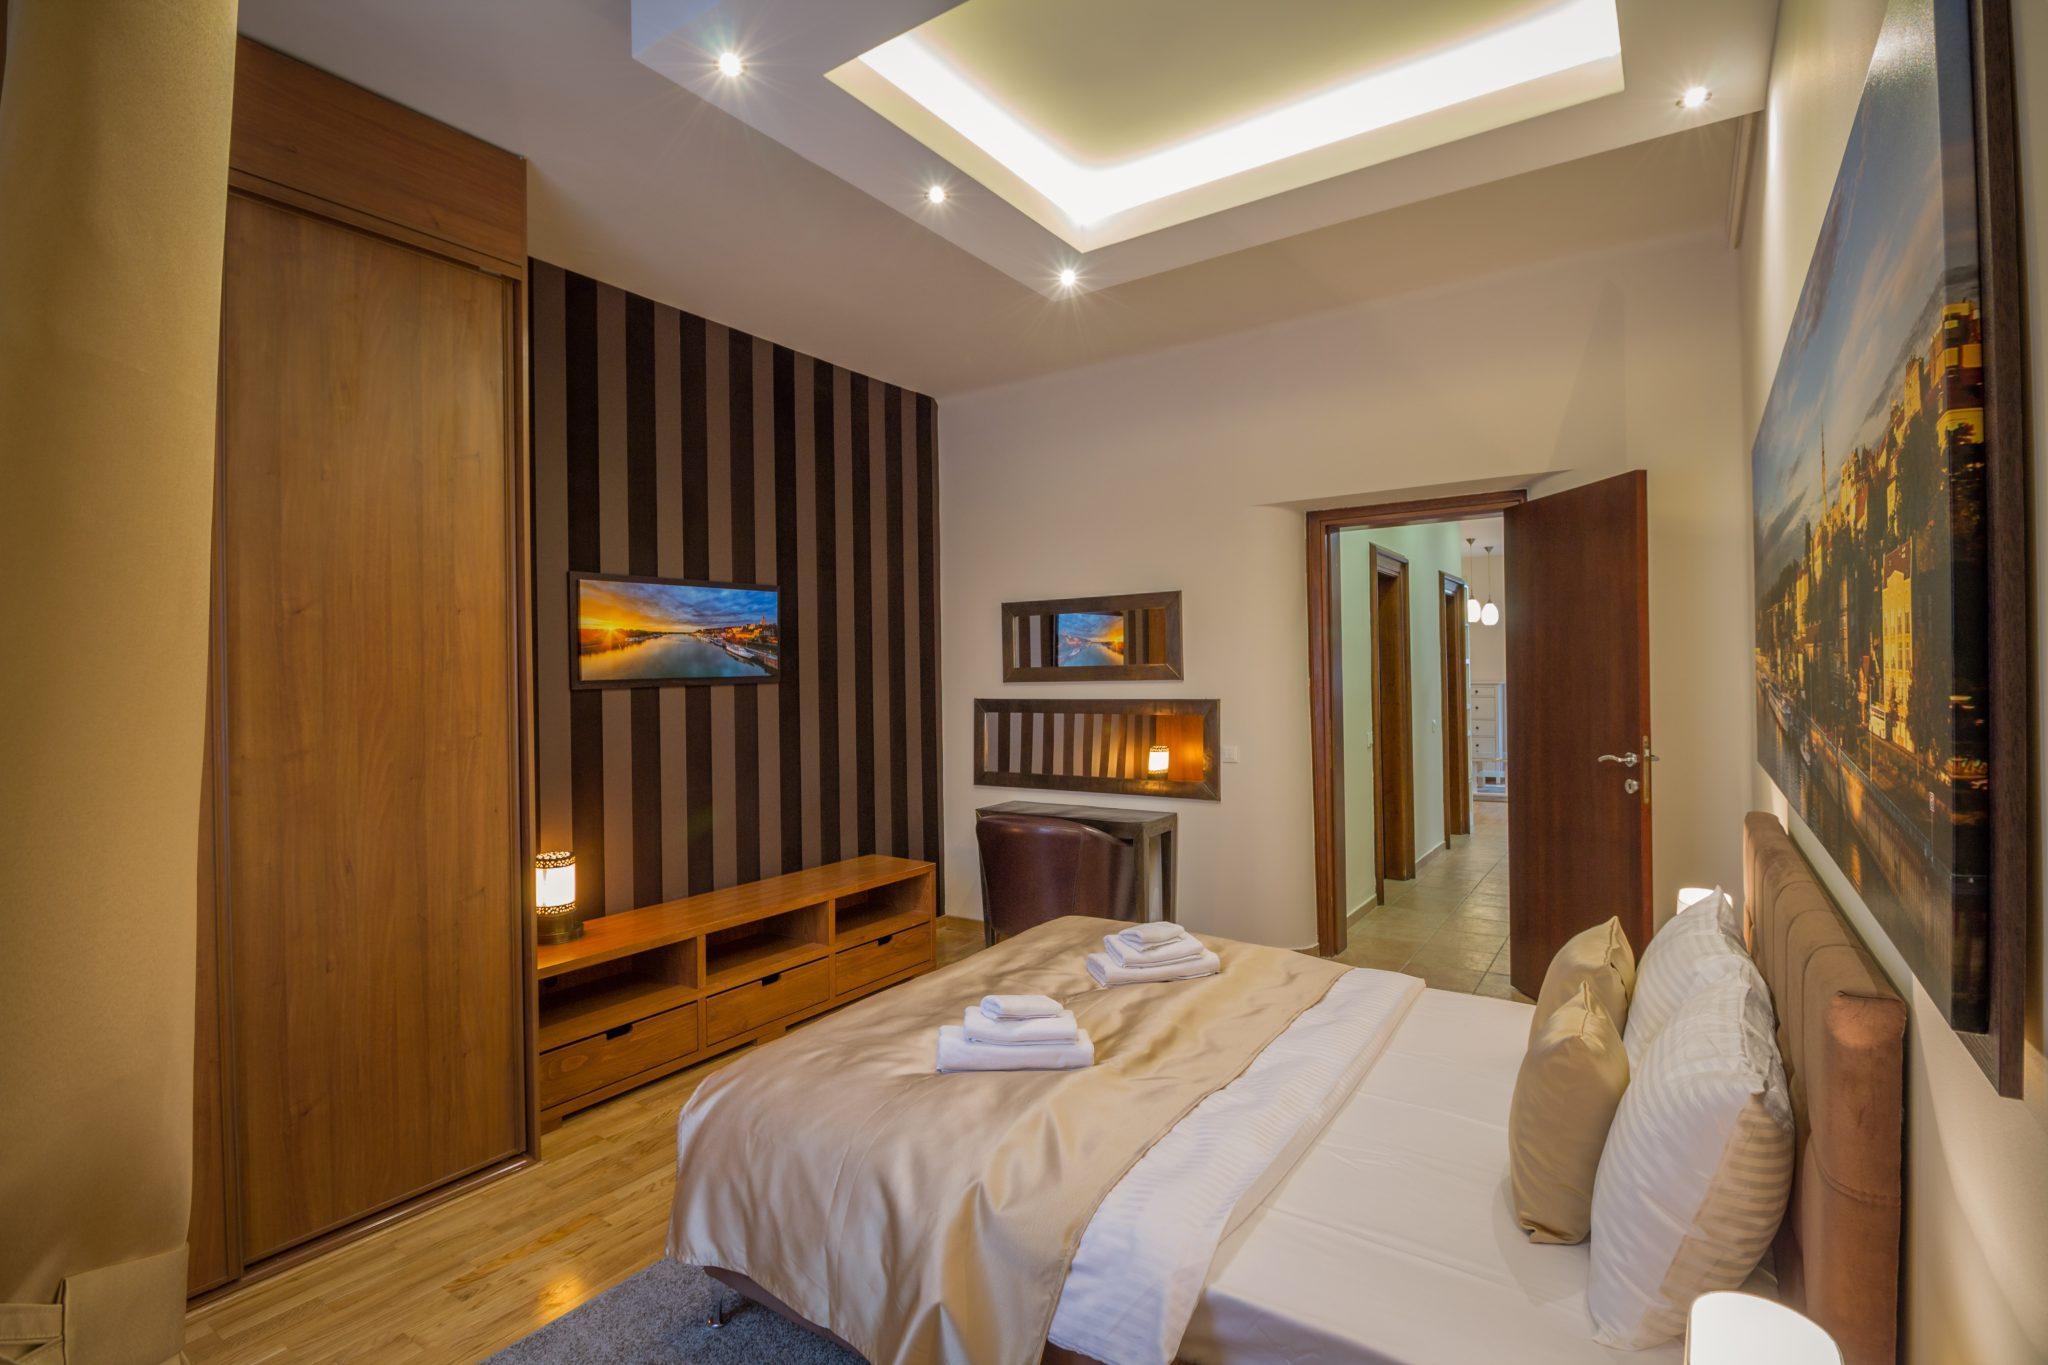 Apartman Superior sa 2 spavace sobe i terasom